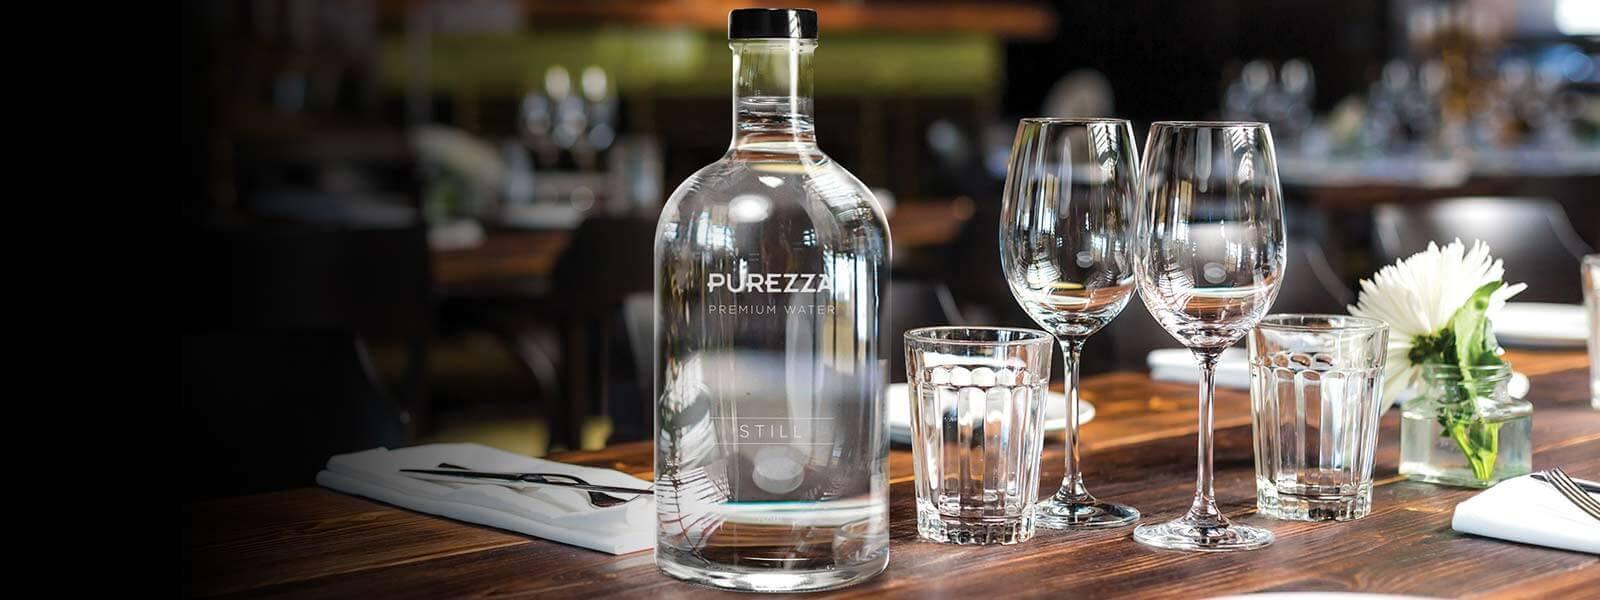 Peachy Premium Chilled Sparkling Water On Tap Purezza Download Free Architecture Designs Intelgarnamadebymaigaardcom